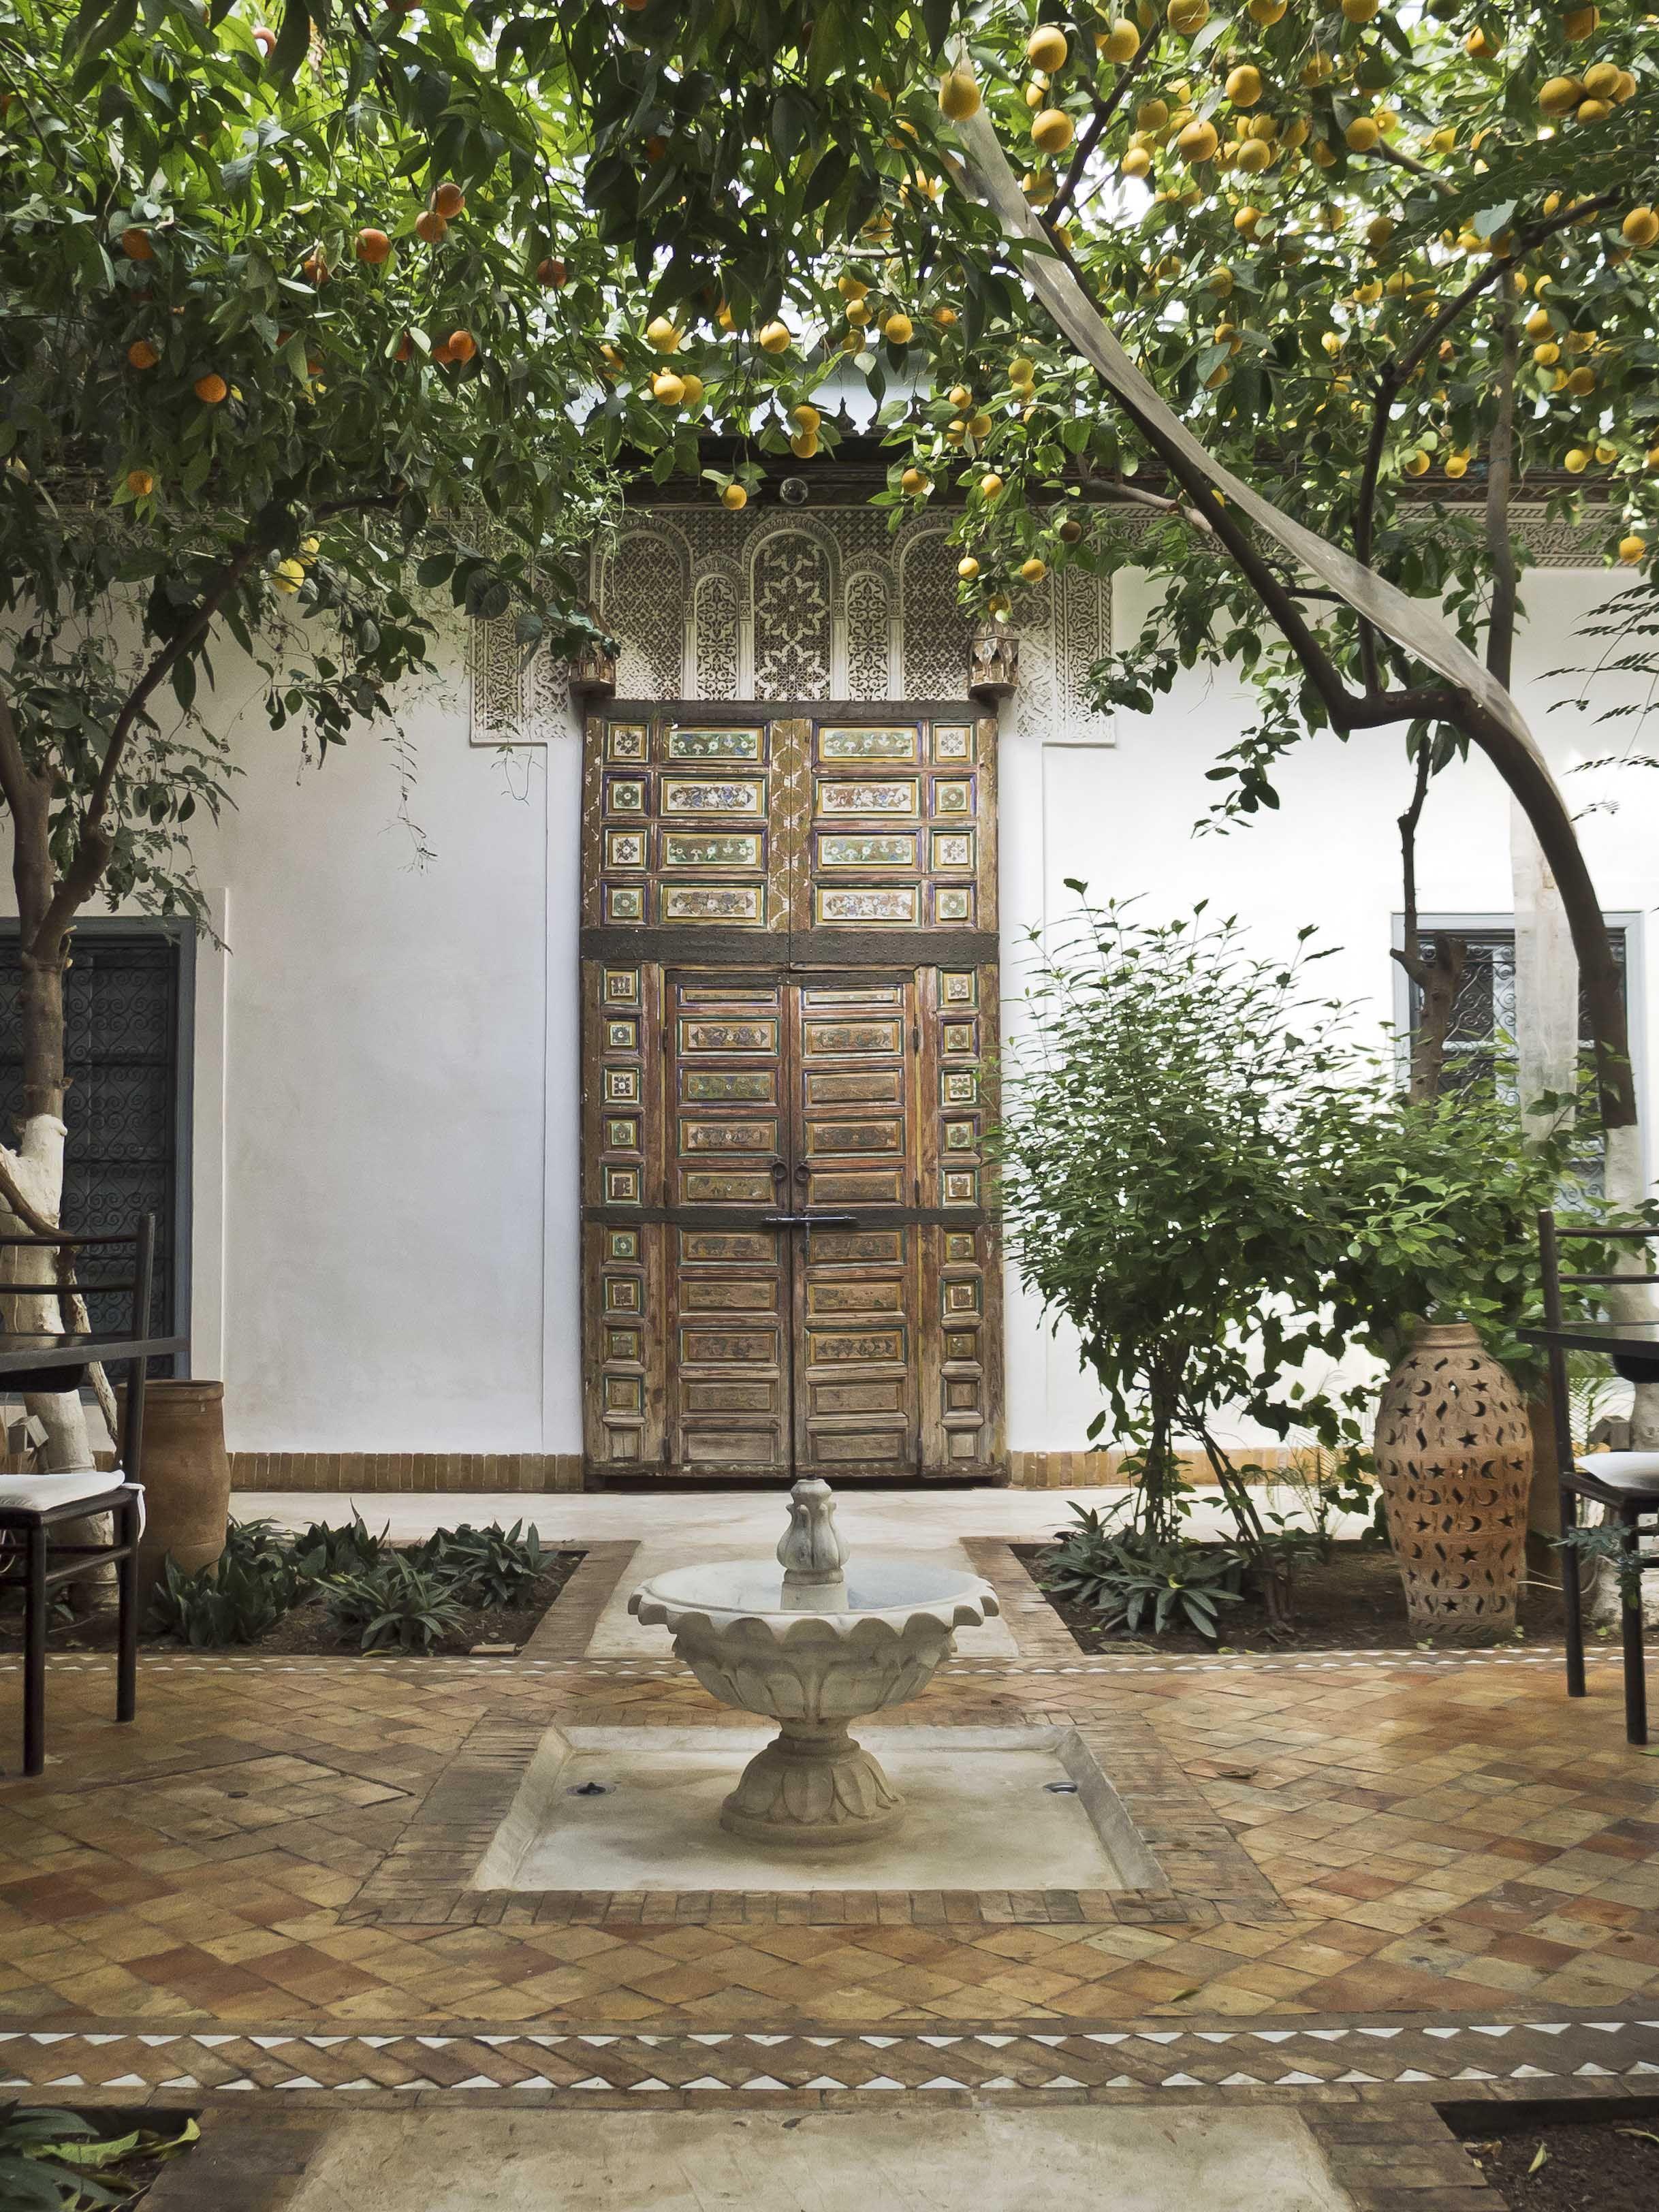 Riad Tchaikana In Marrakech Note Parapet Decor Door Patio Marrakech Riad Maroc Architecture Marocaine